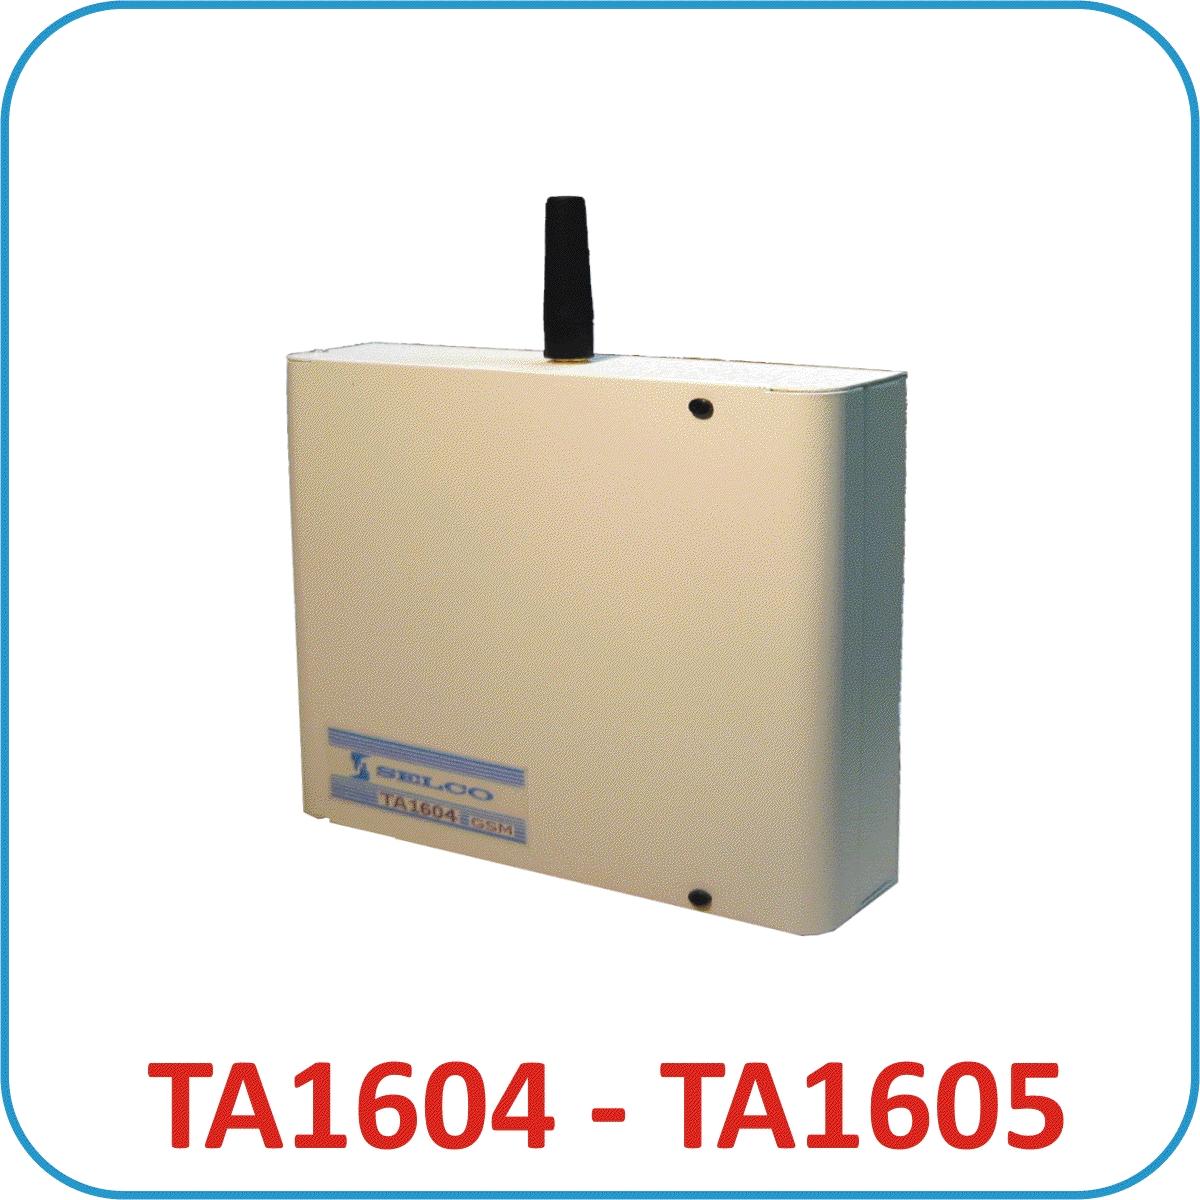 COMBINATORI TELEFONICI RETE GSM TA1604 - TA1605